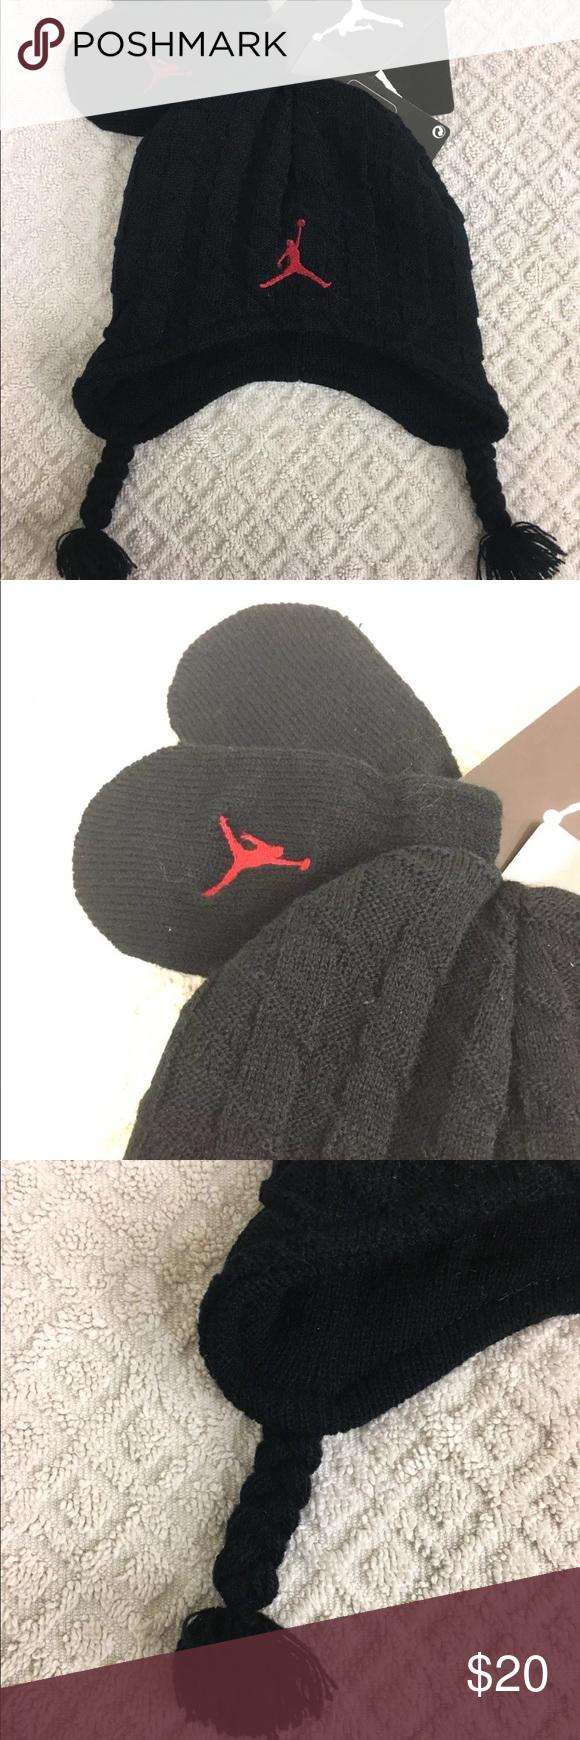 8bd325f839d Jordan Black Red Hat   Mitten Set NEW Infant 12-24 NIKE Jordan Peruvian